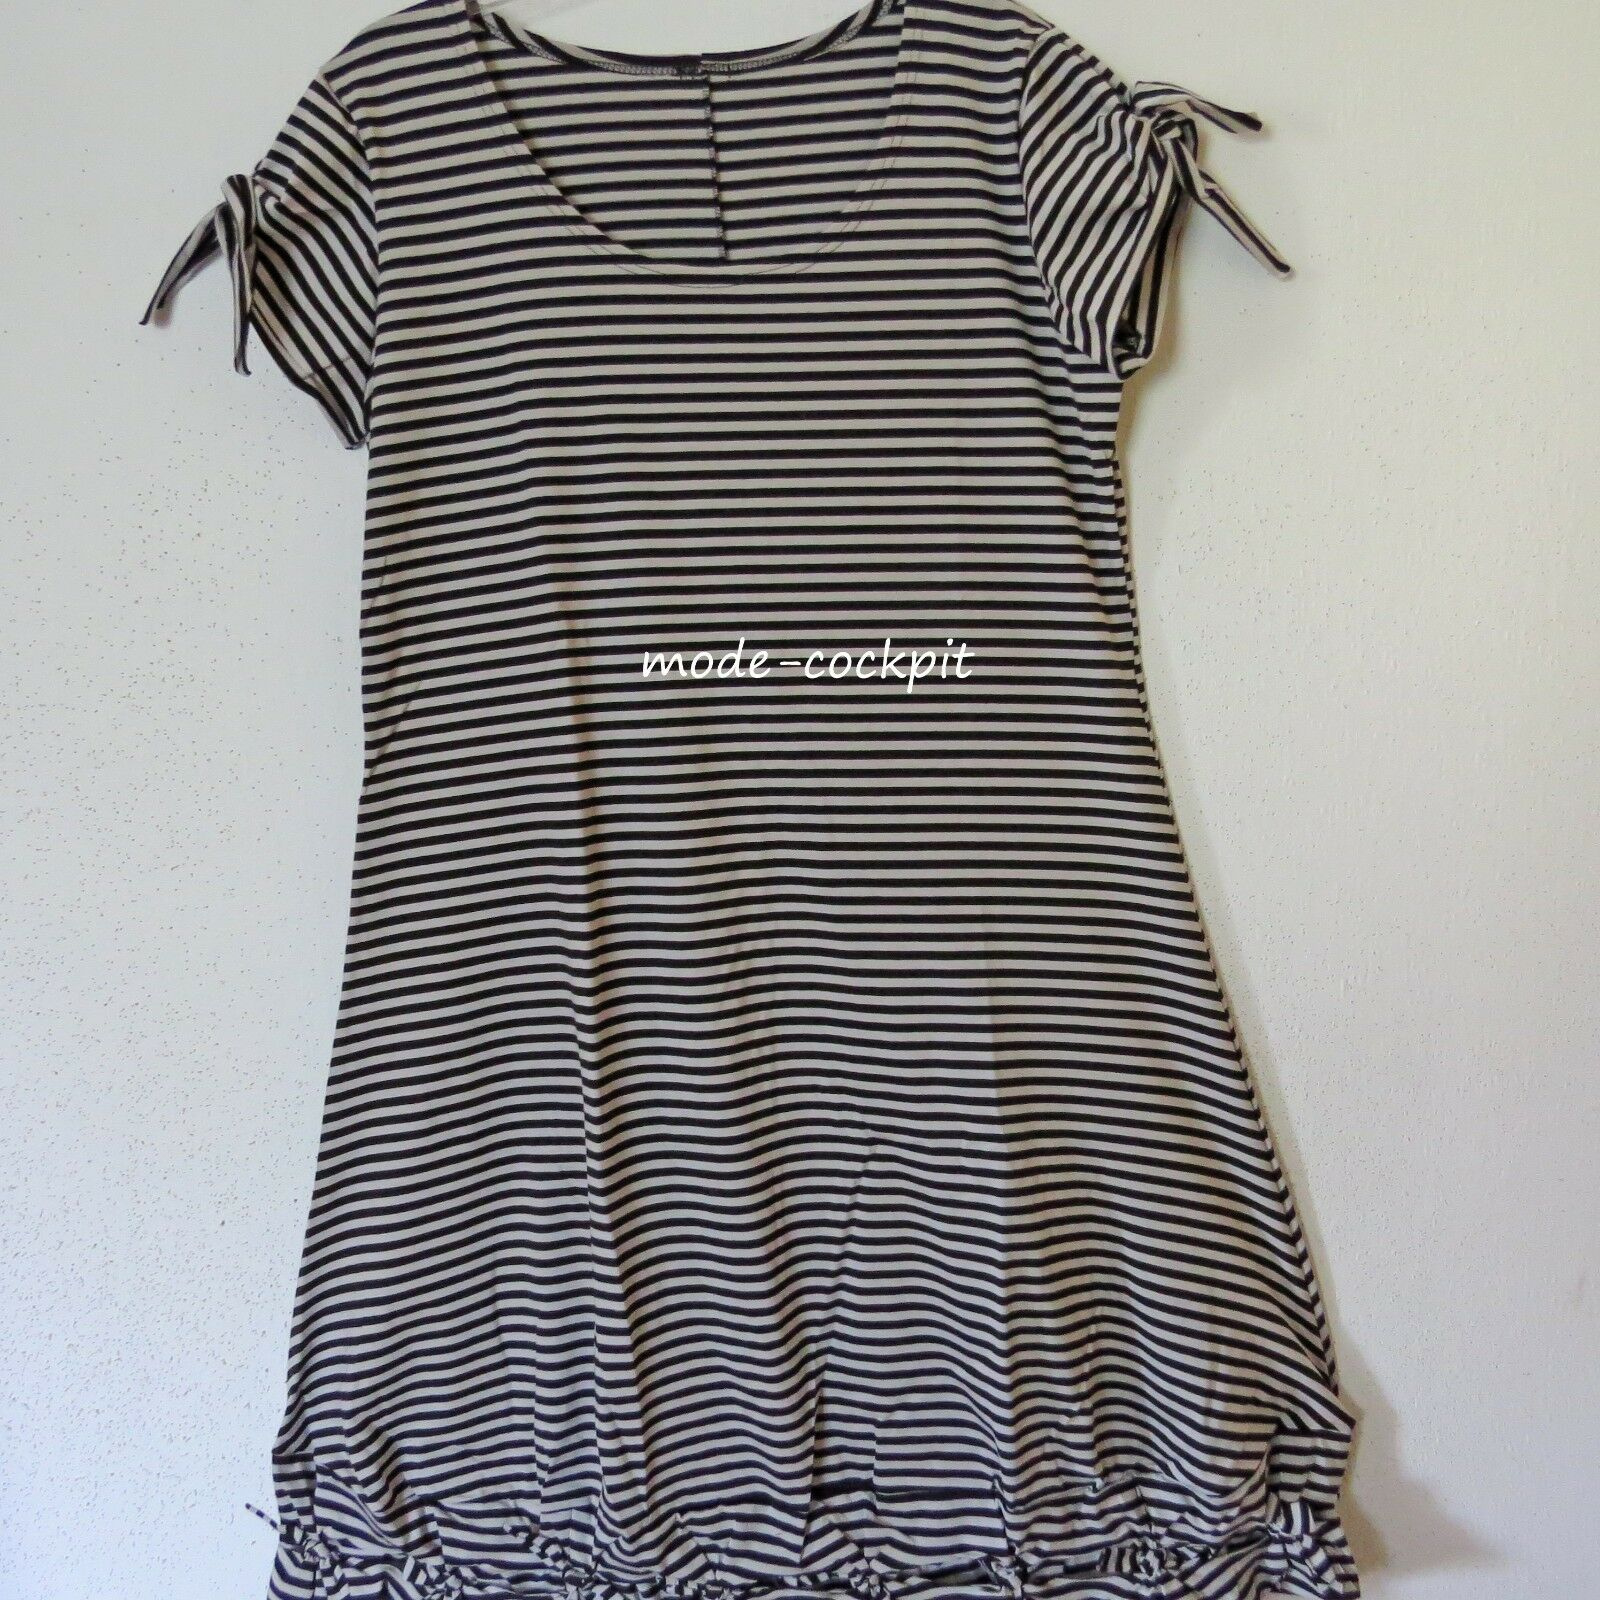 BORIS INDUSTRIES süßes Shirt Kleid Knotensaum Baumwolle schwarz-silbergrau 48(5)